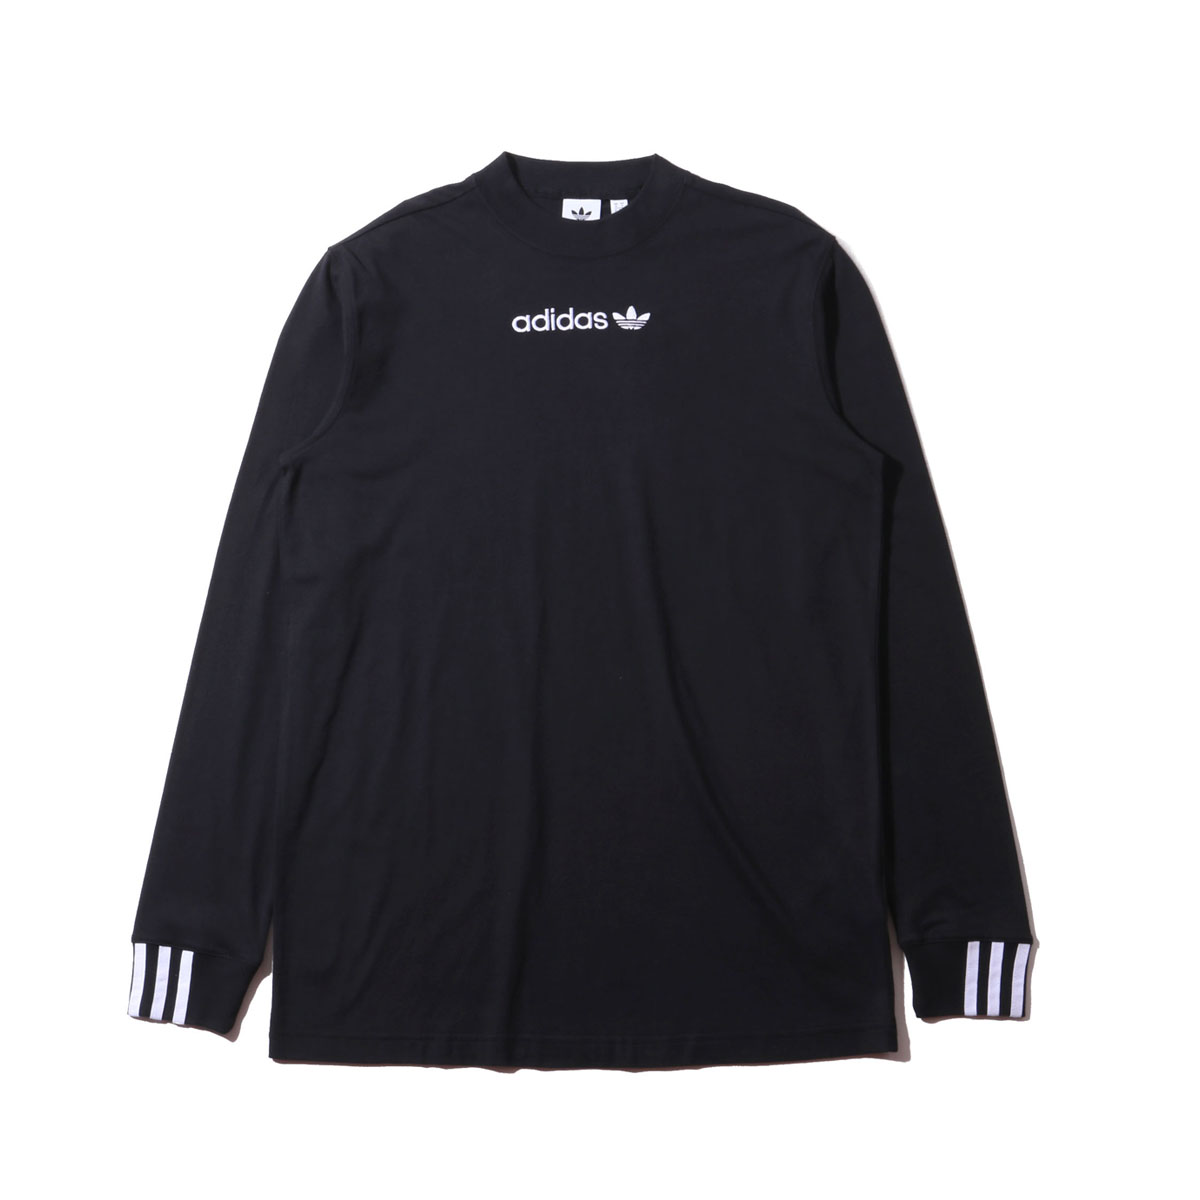 bfa8441aa5 adidas Originals COEEZE LS TEE (BLACK) (Adidas originals COEEZE LS tea) ...